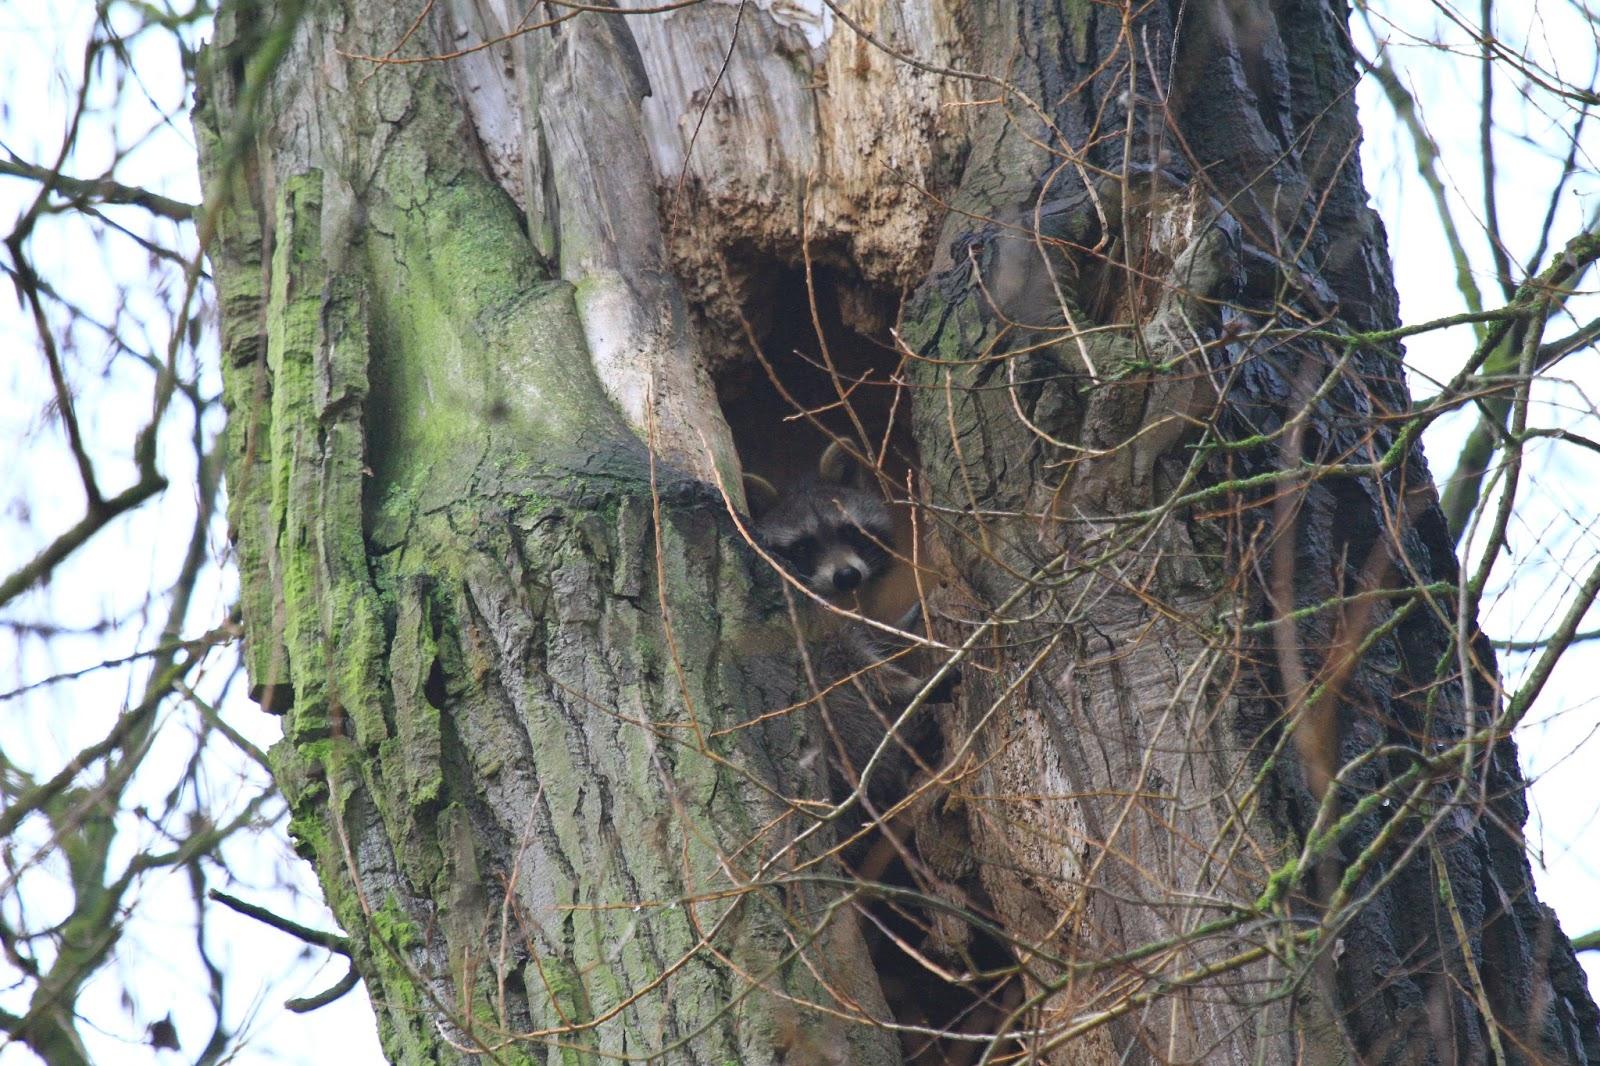 waldl ufer waschb ren im baum kranker waschb r raccoon in the tree sick raccoon. Black Bedroom Furniture Sets. Home Design Ideas